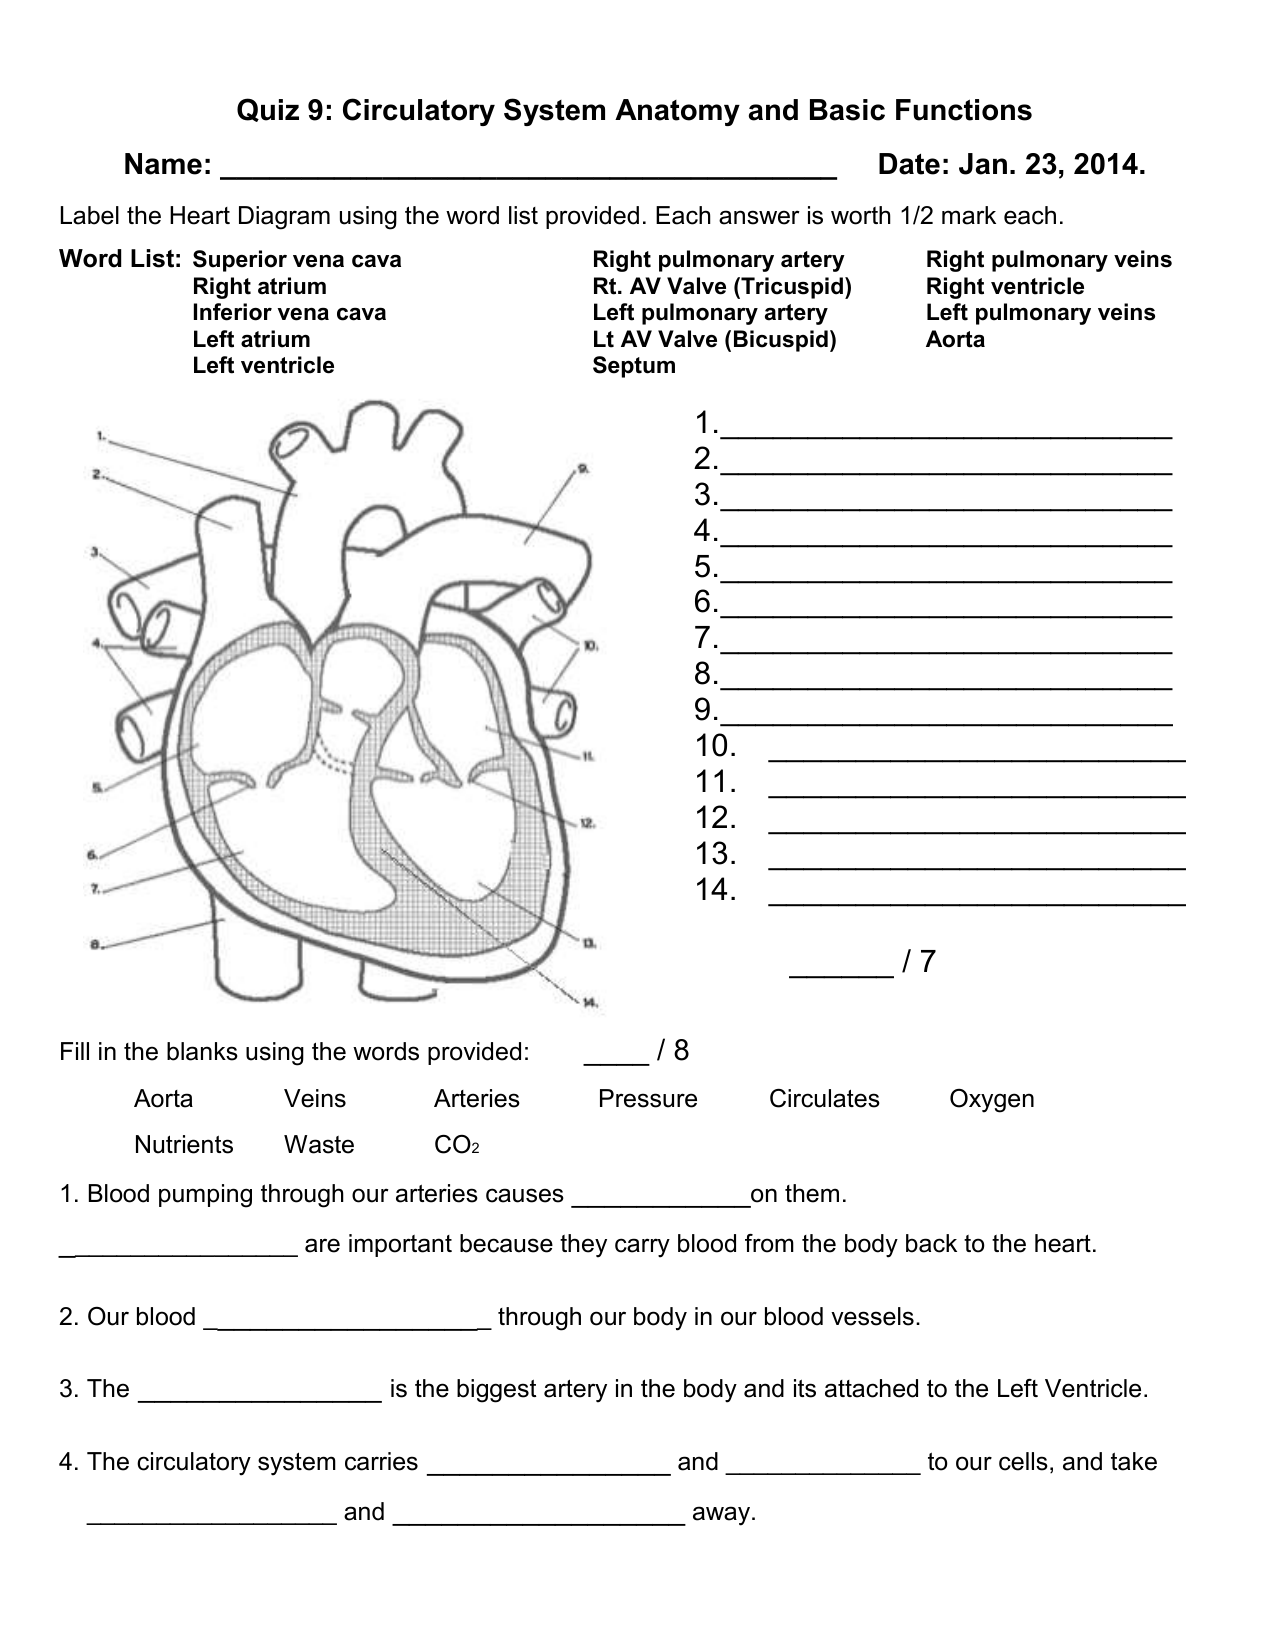 Quiz 9: Circulatory System Anatomy and Basic Functions